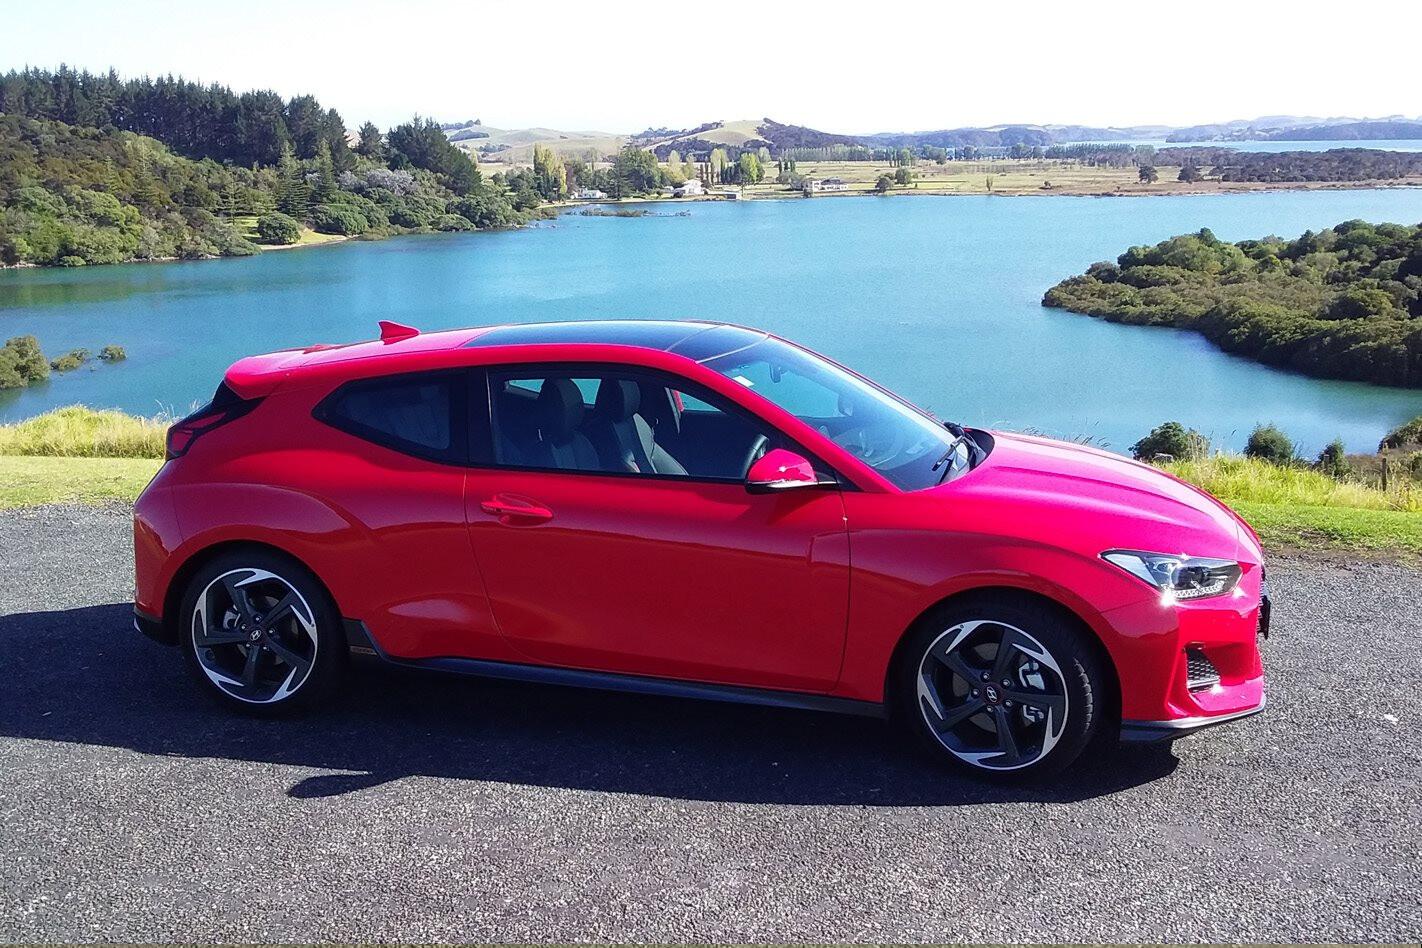 Hyundai Veloster Turbo New Zealand